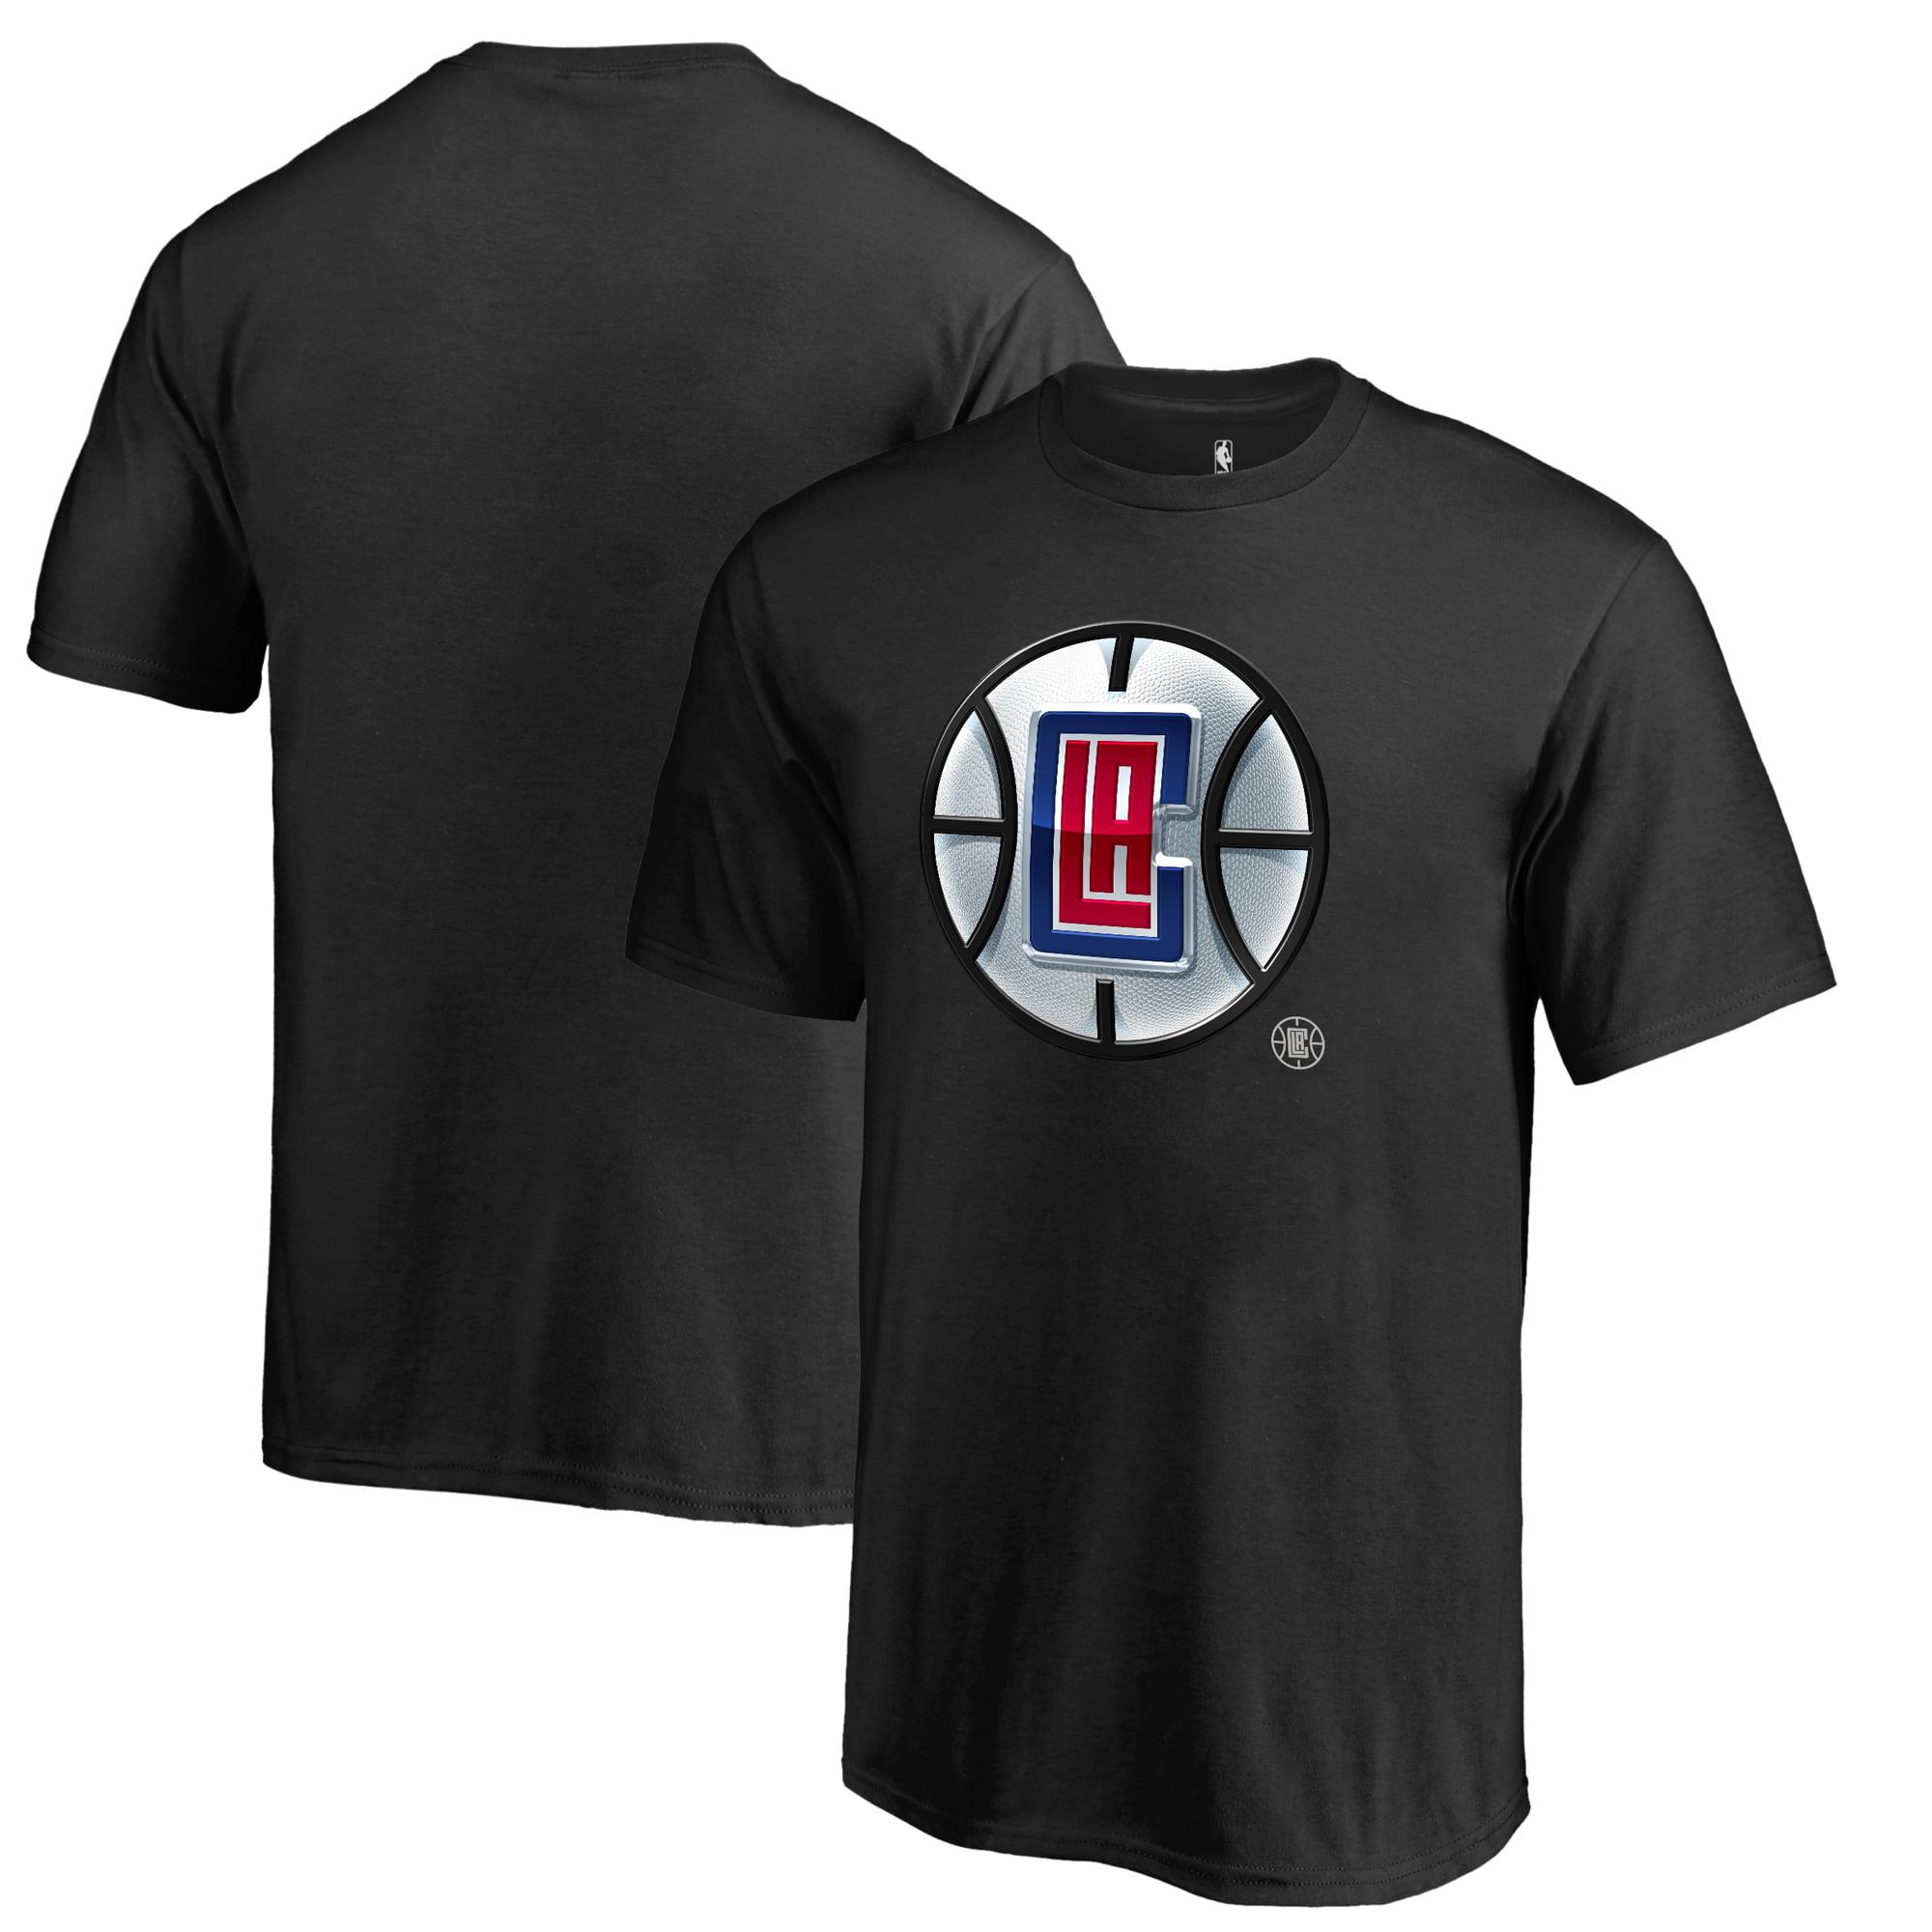 LA Clippers Fanatics Branded Youth Midnight Mascot T-Shirt - Black